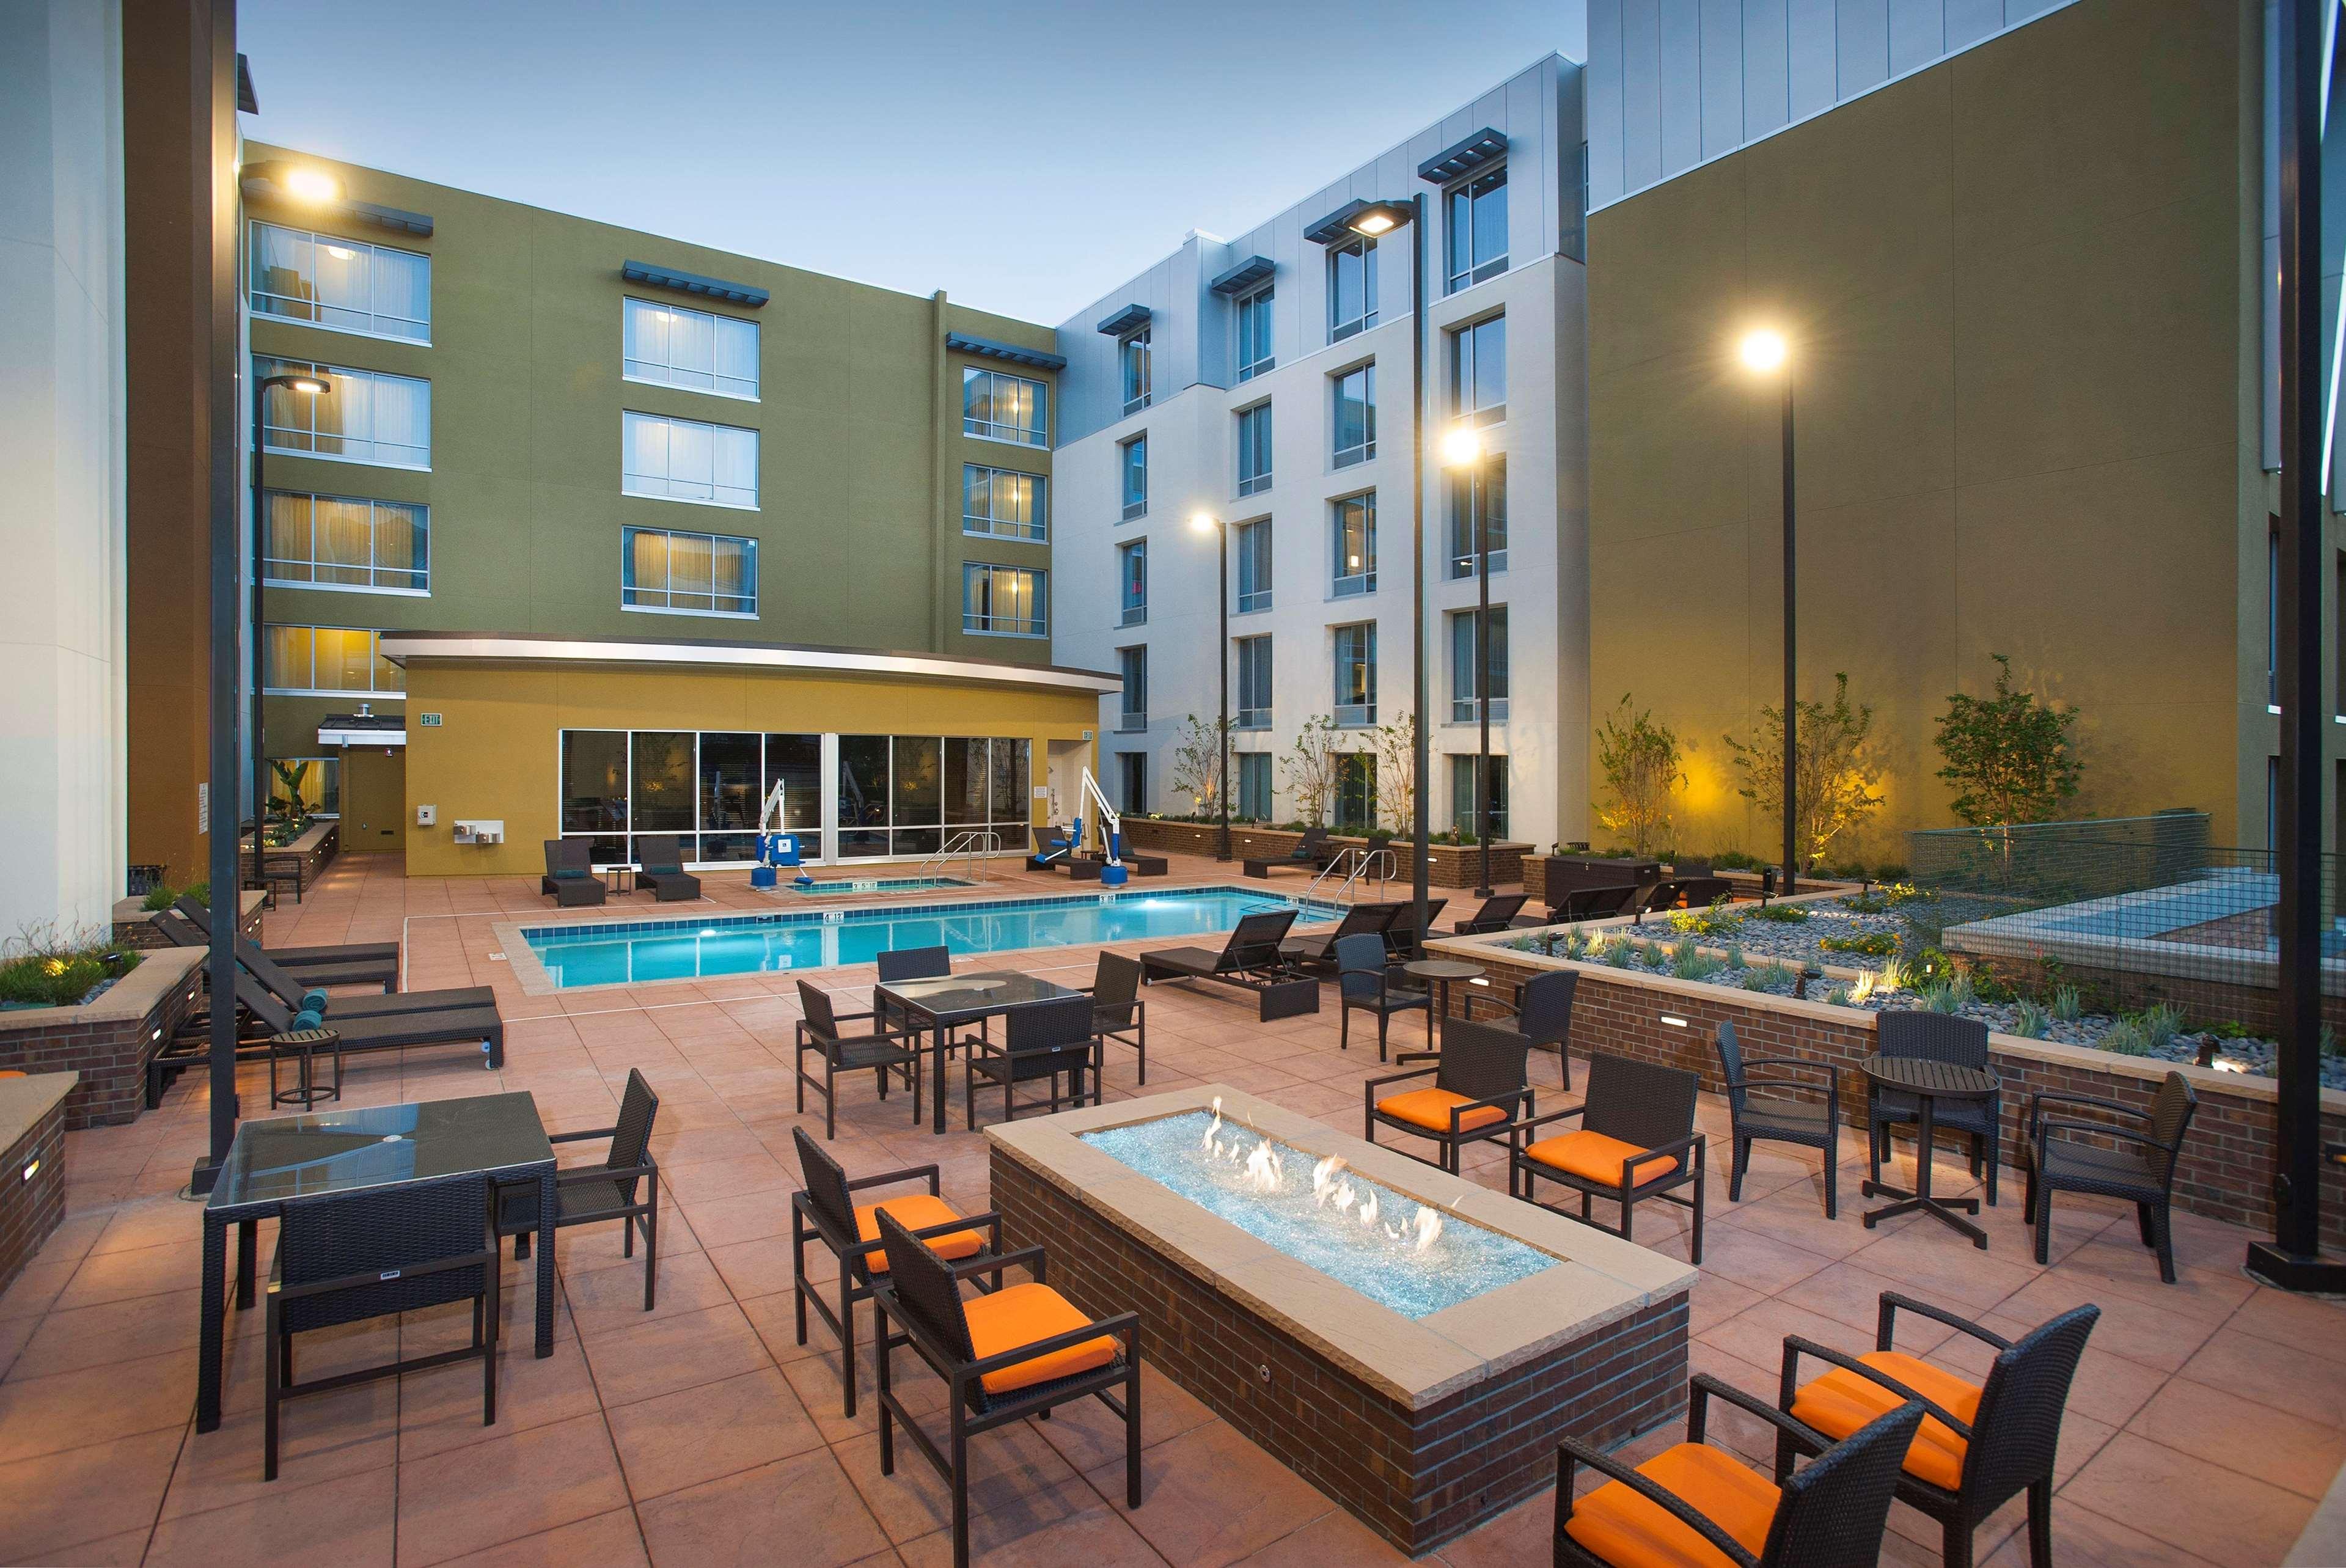 Hilton Garden Inn Burbank Downtown In Burbank Ca 91502